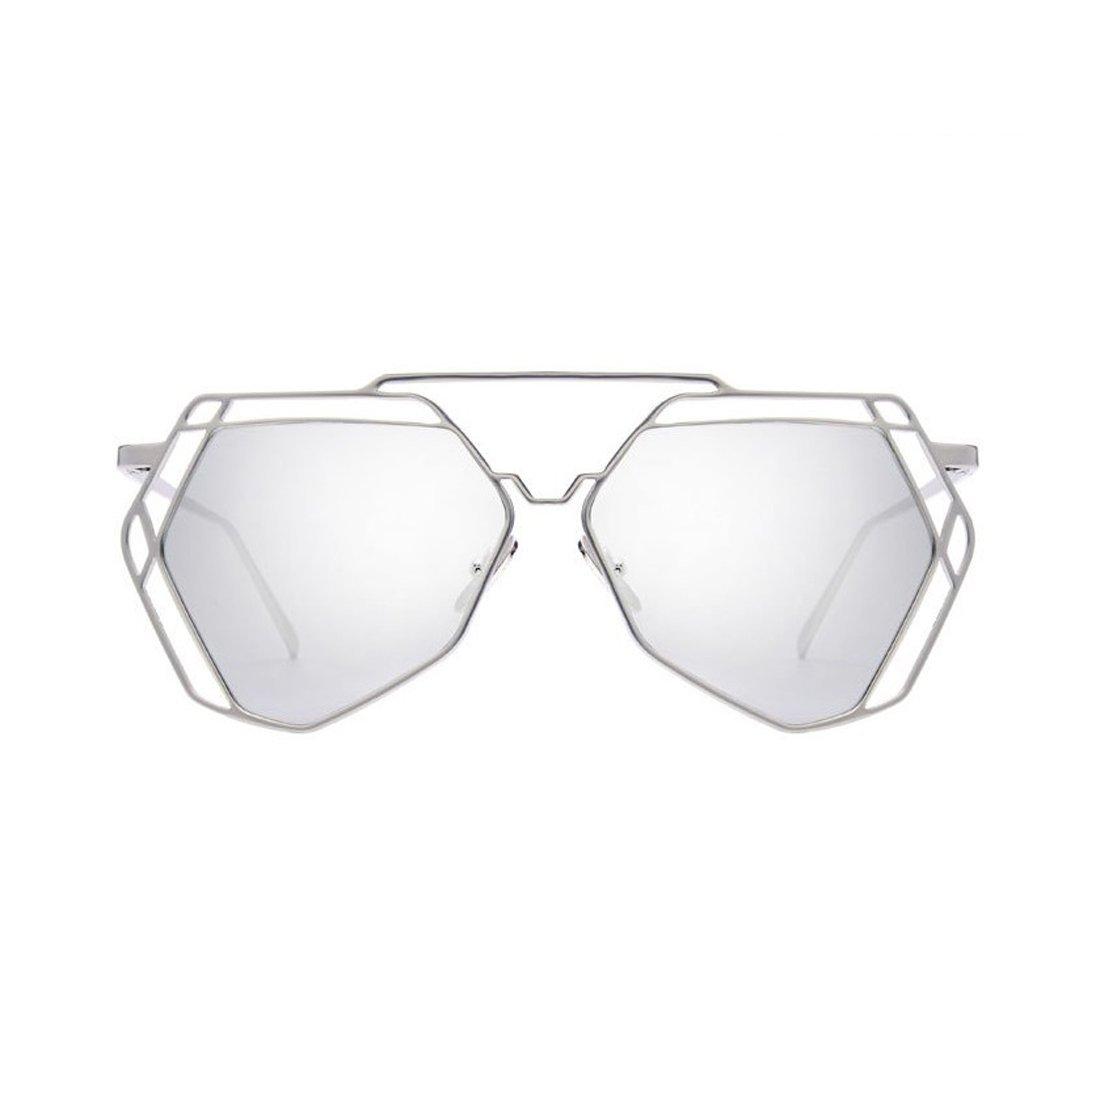 c2c9be9ff3 Amazon.com  Blue Sunglasses women Hollow Out Metal Frame Design Hexagon  UV400 Protection Sun Glass  Clothing